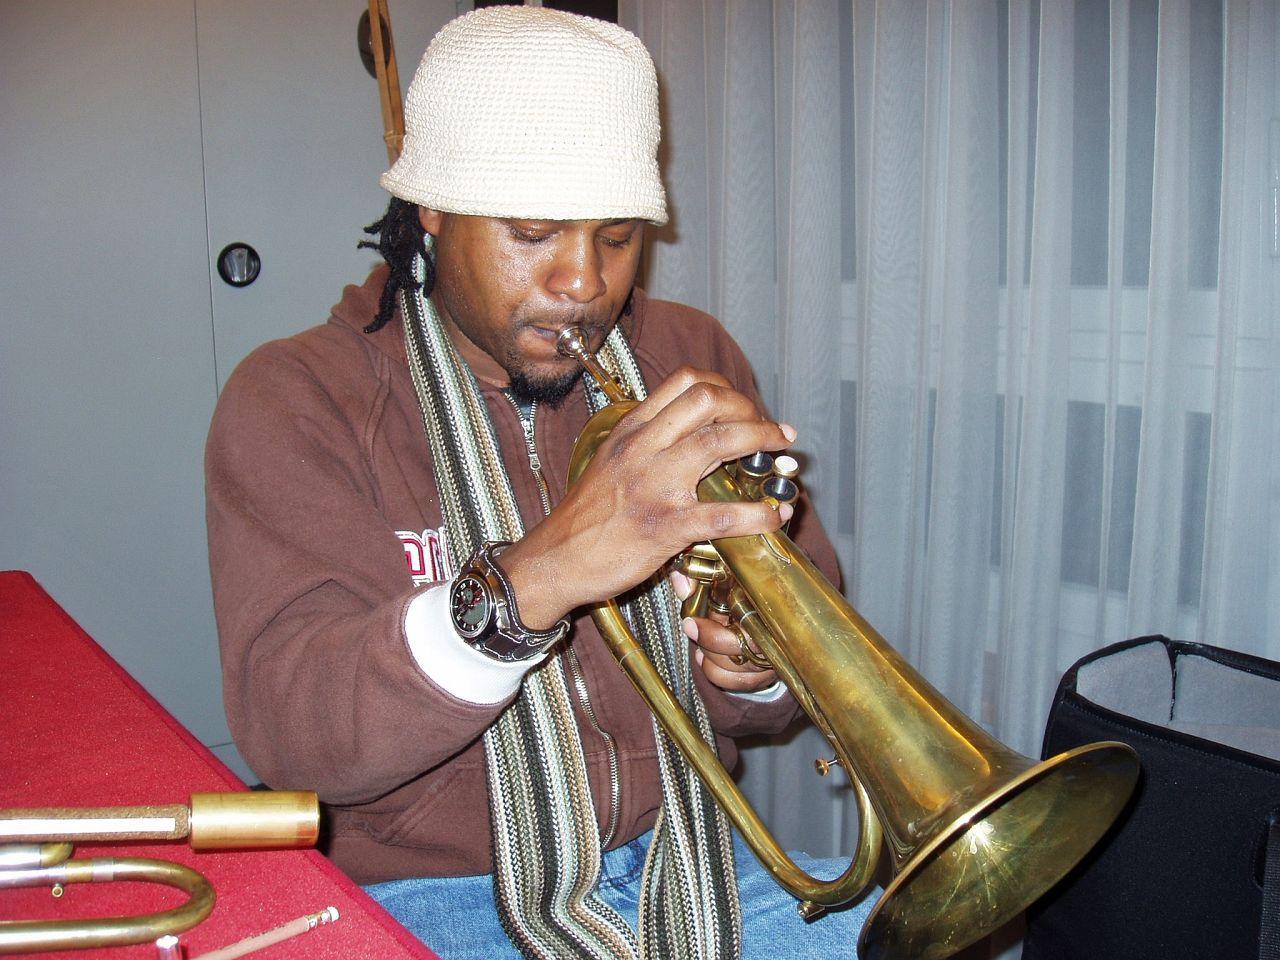 Musiker 272